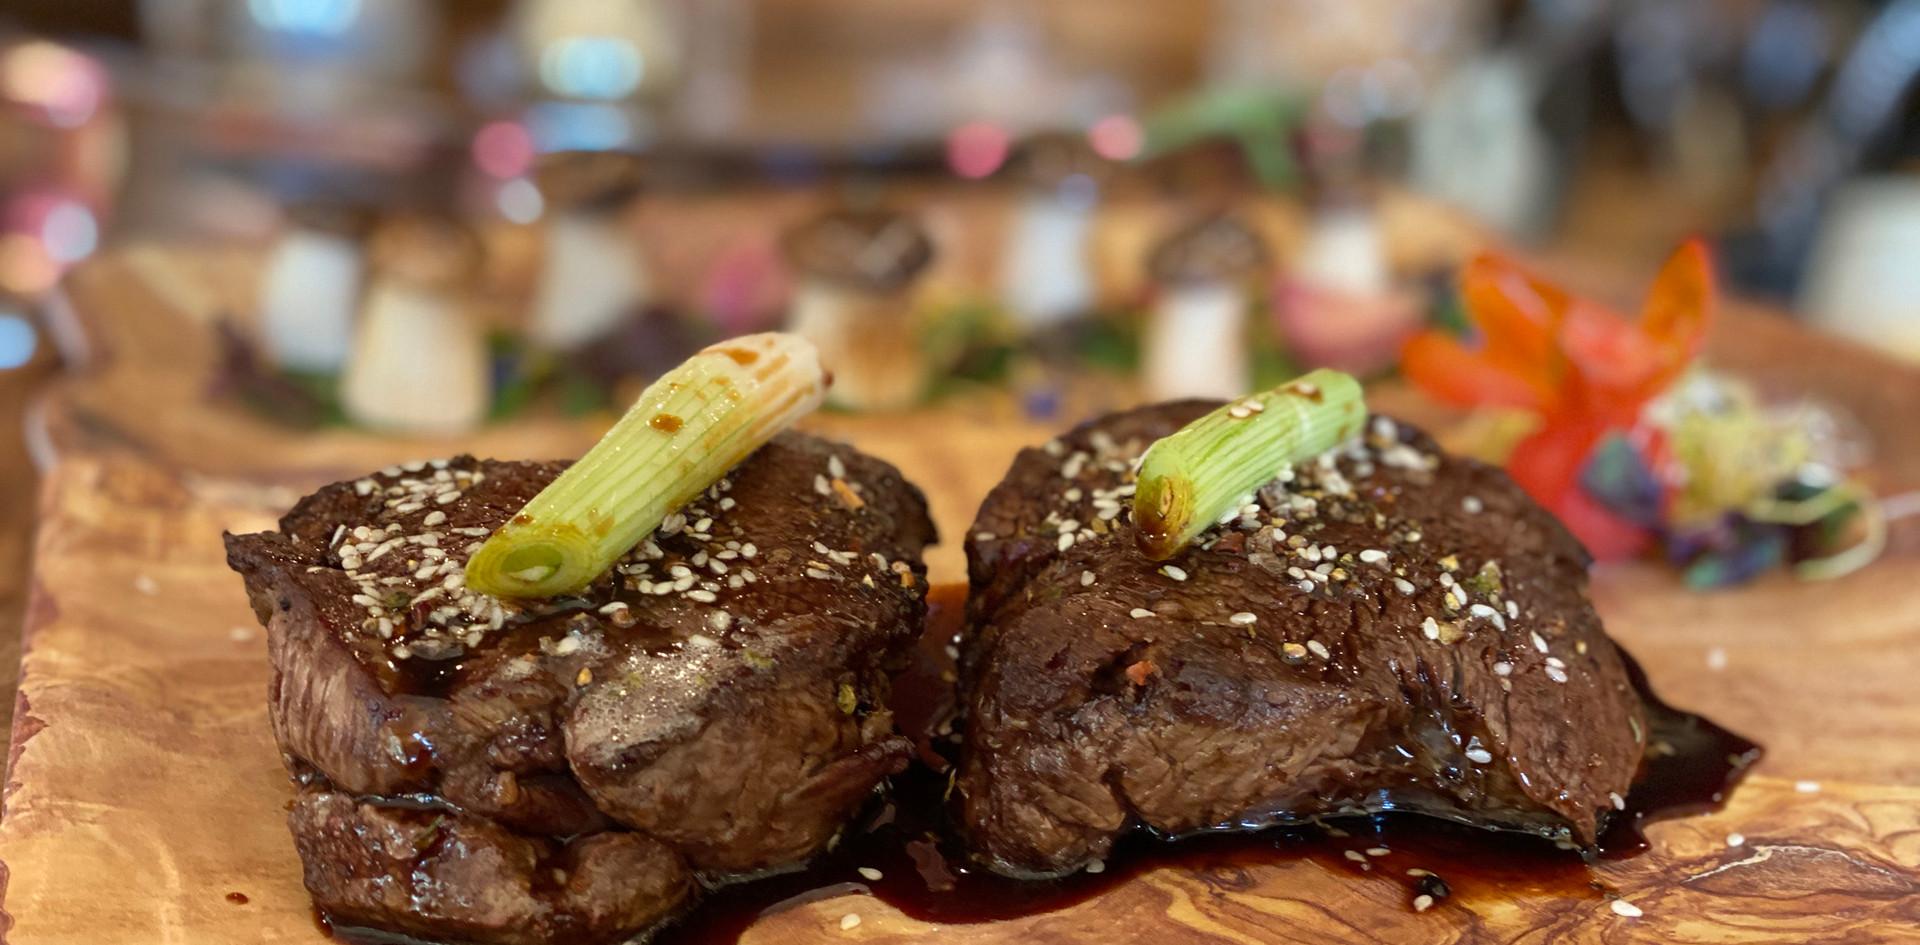 Schwein Restaurant Dinner - Hotel Wegner - The culinary Art Hotel